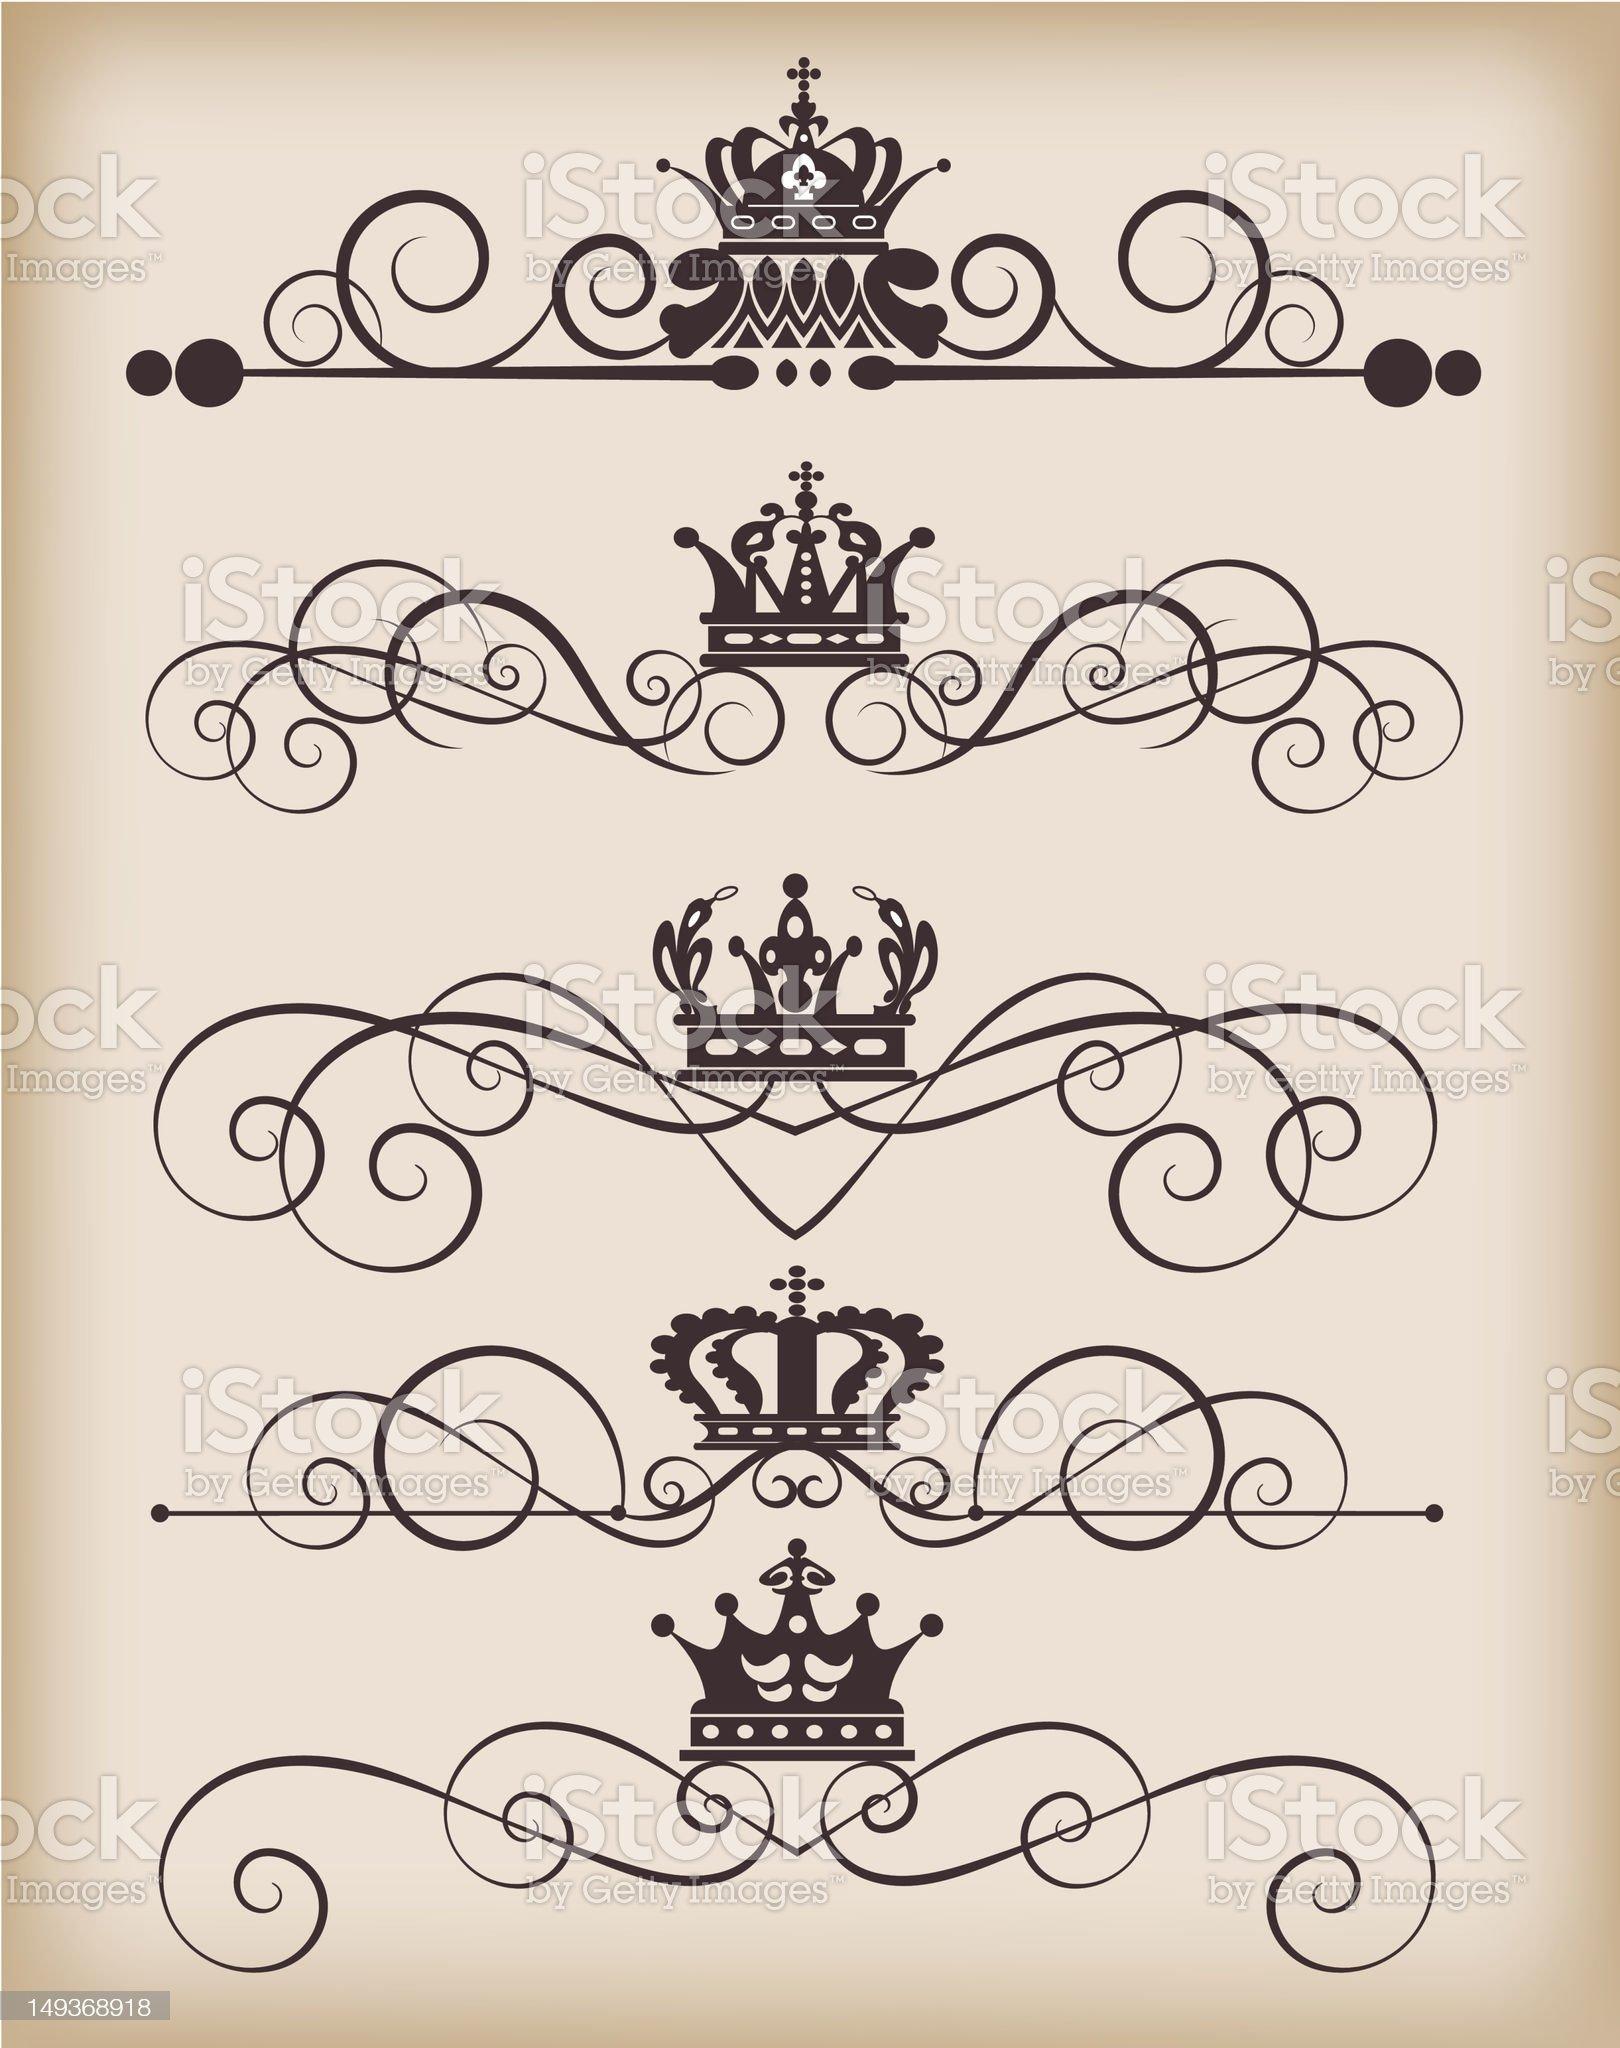 Vector Design Elements - set 29 royalty-free stock vector art